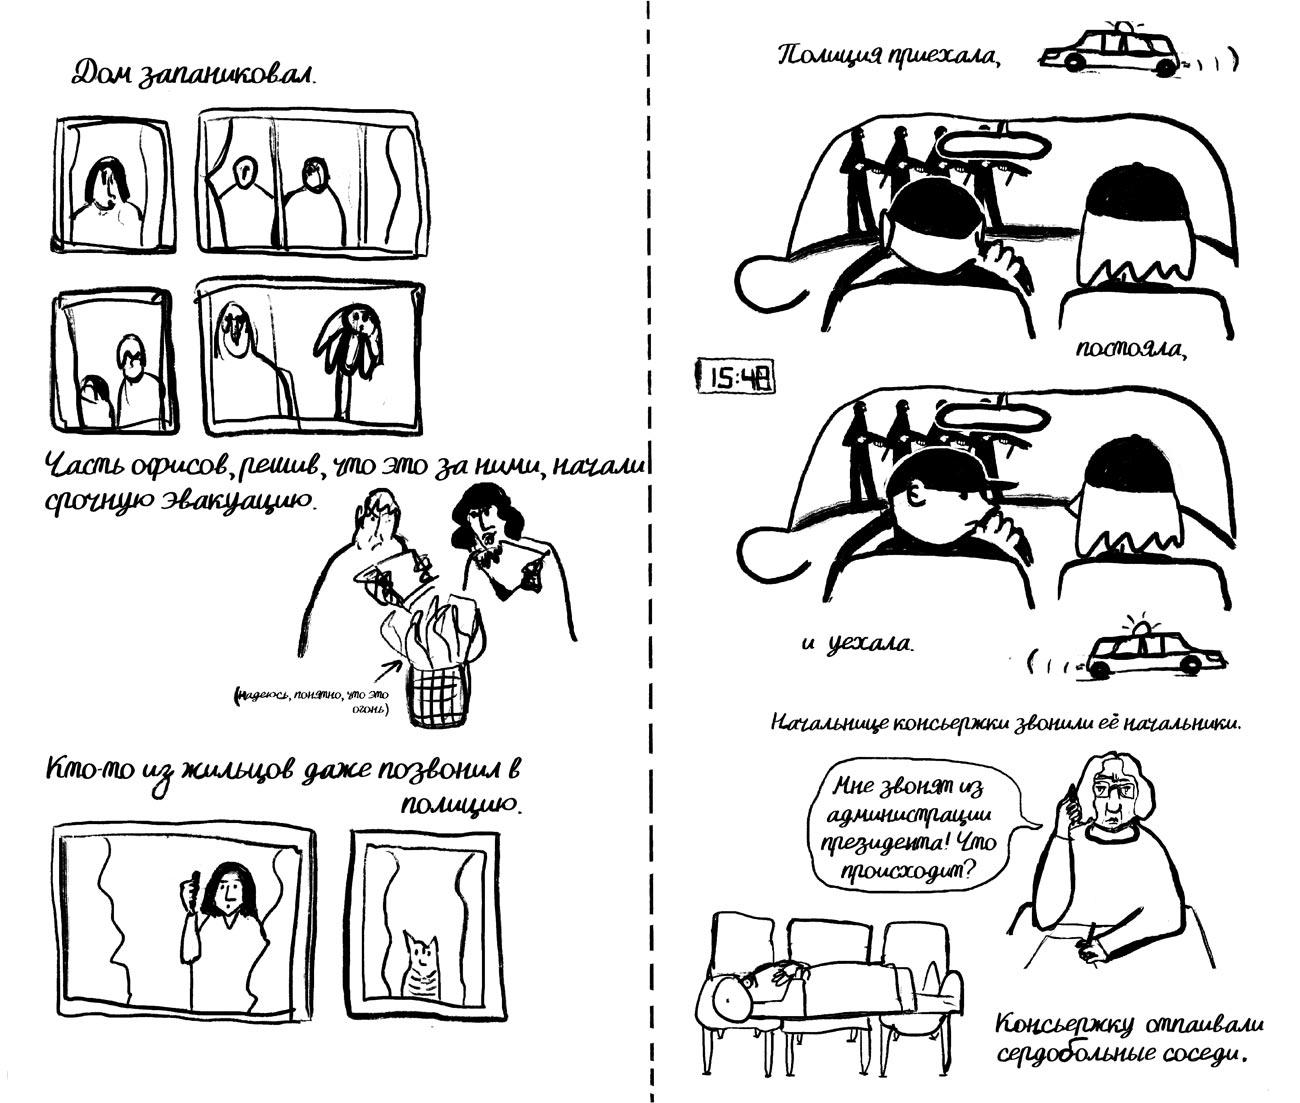 comisc yard 11 - <b>Драма на парковке.</b> Комикс Тани Кремень про кумовство и коррупцию - Заборона